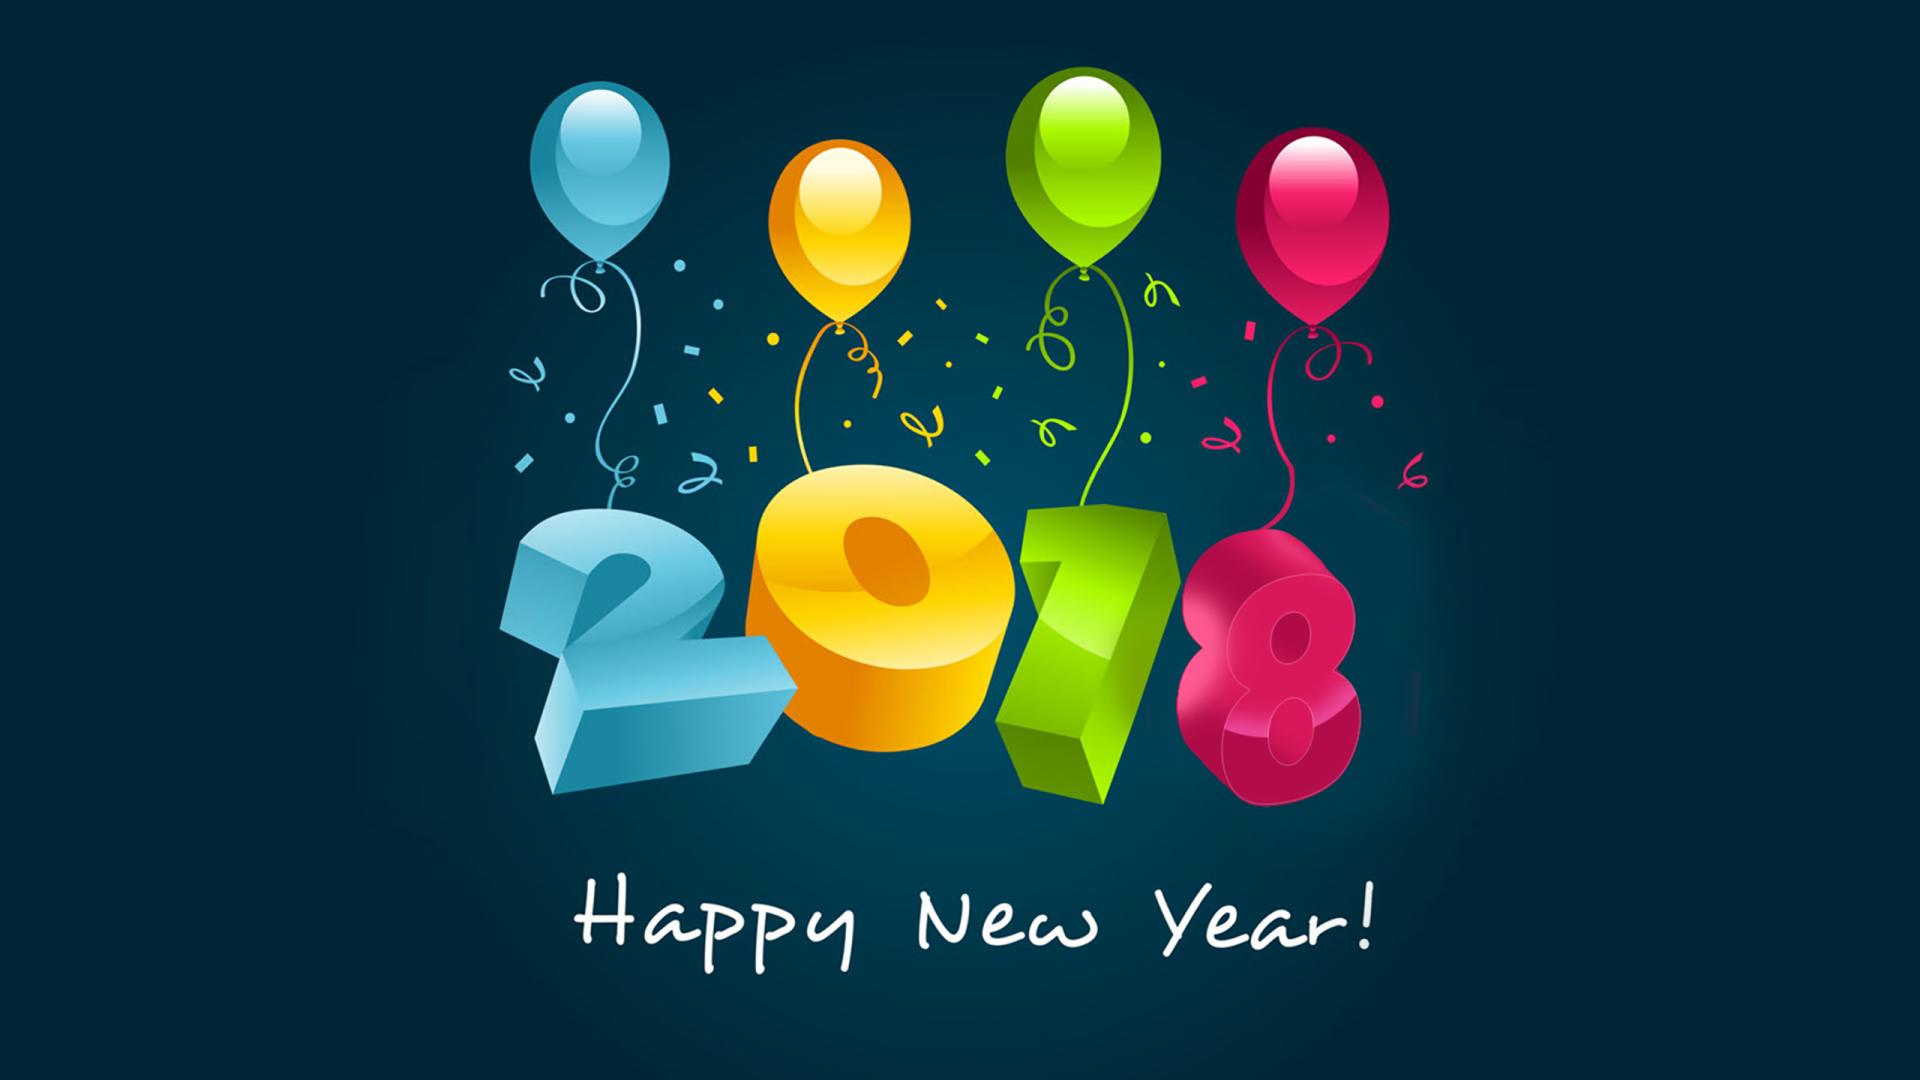 Helgdag - New Year 2018  Helgdag Ny år Bakgrund